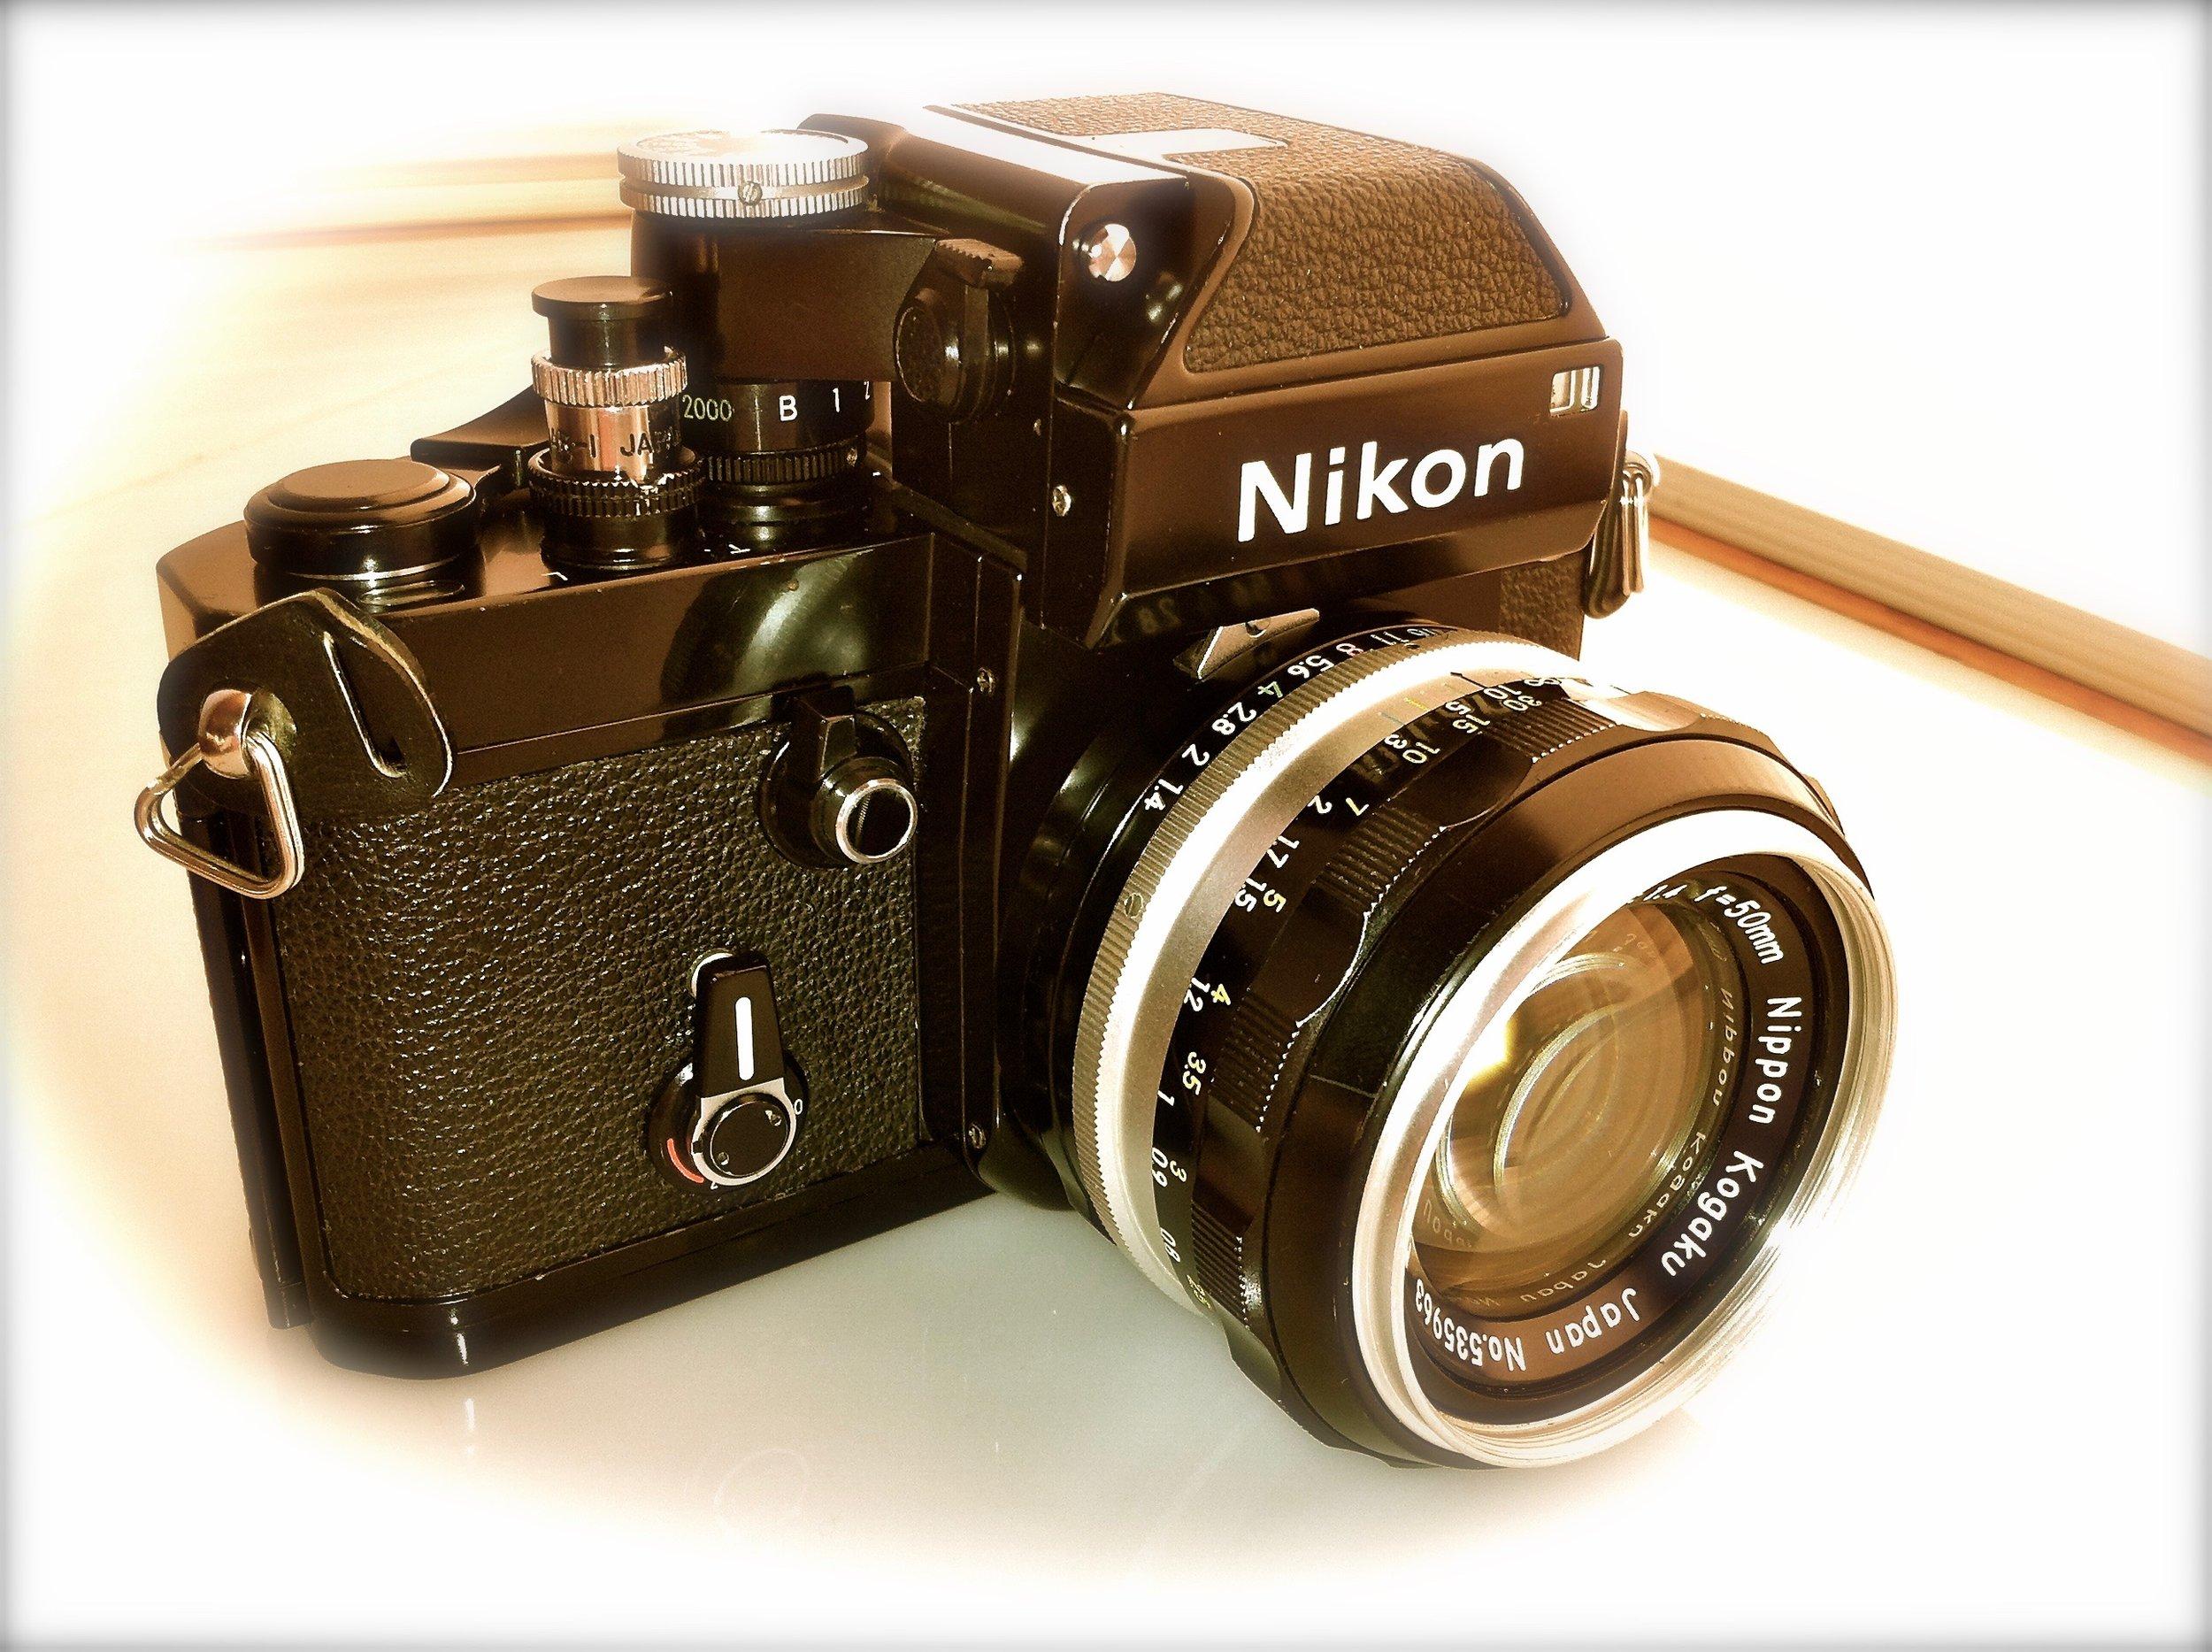 Nikon F2 Photomic 50mm pre-Ai Nikkor